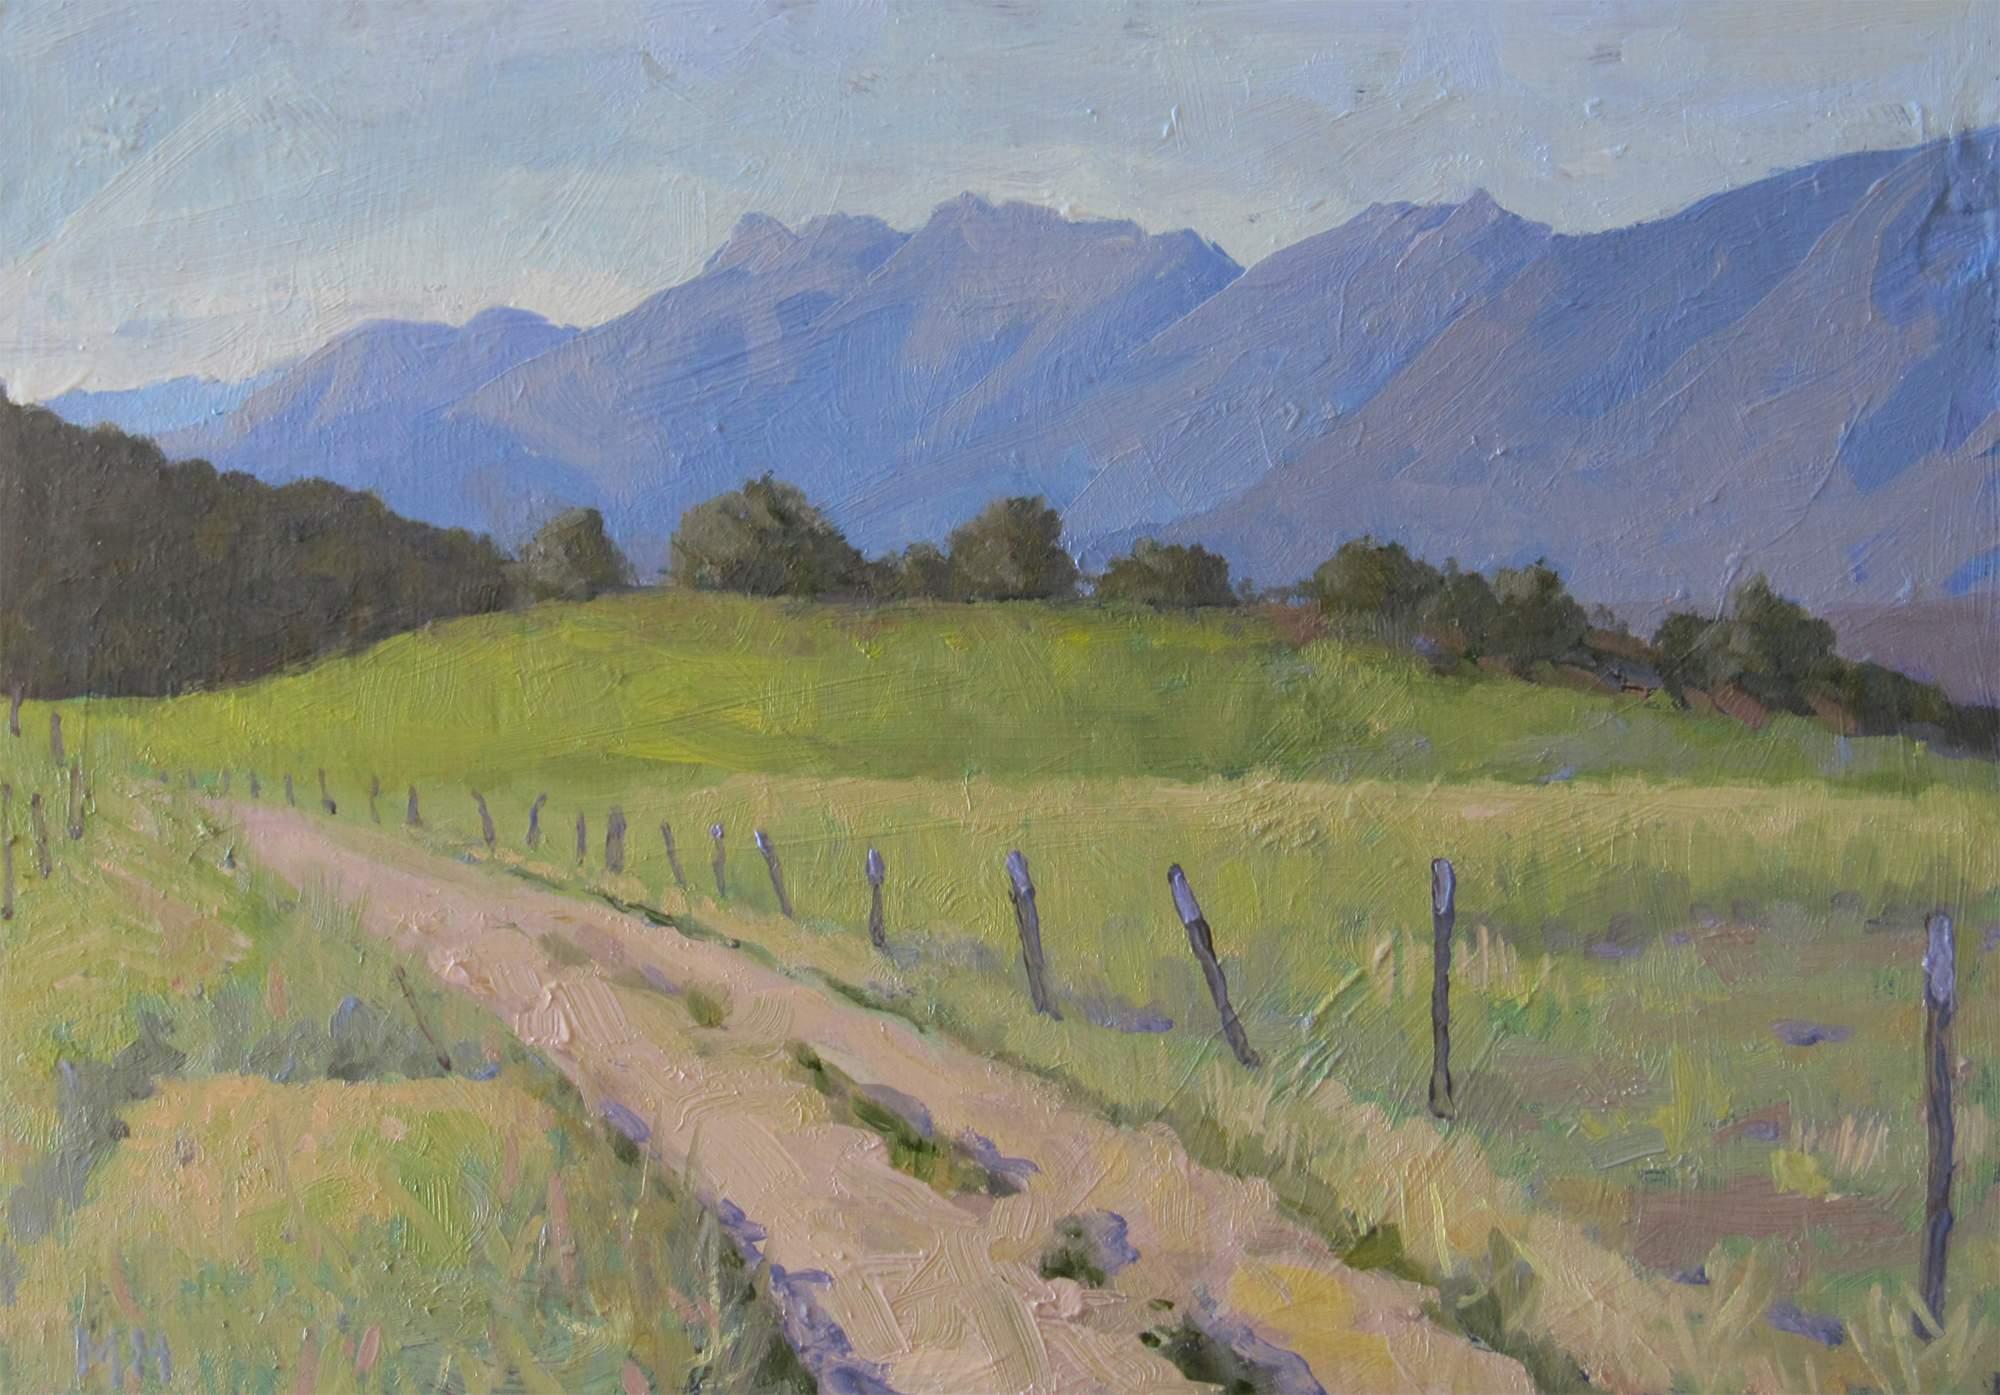 Cheri's Driveway by  Melissa Hefferlin - Masterpiece Online